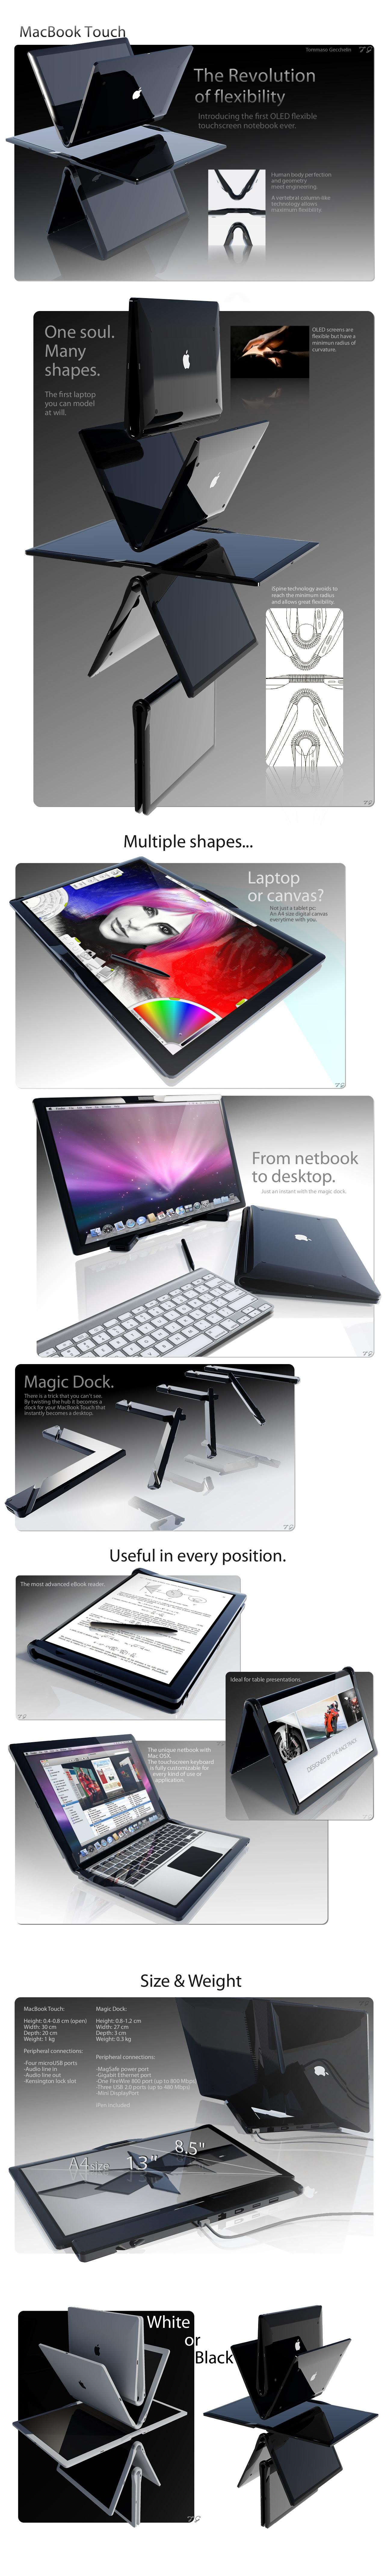 macbook-touch-beta-20